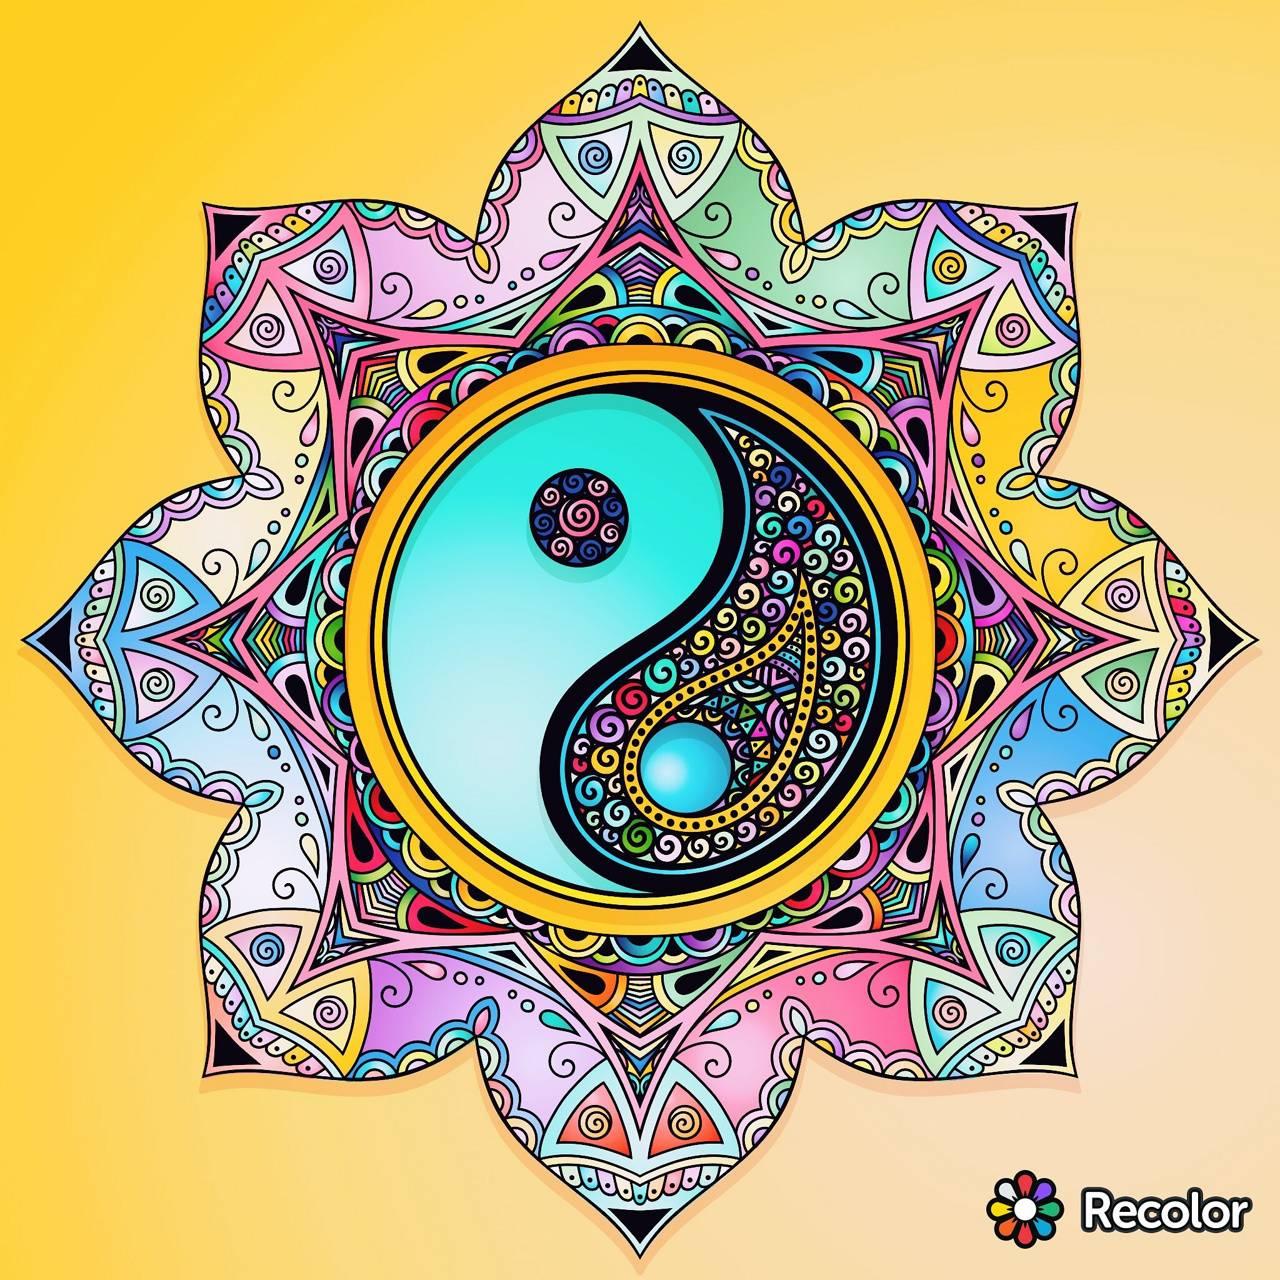 Ying yag